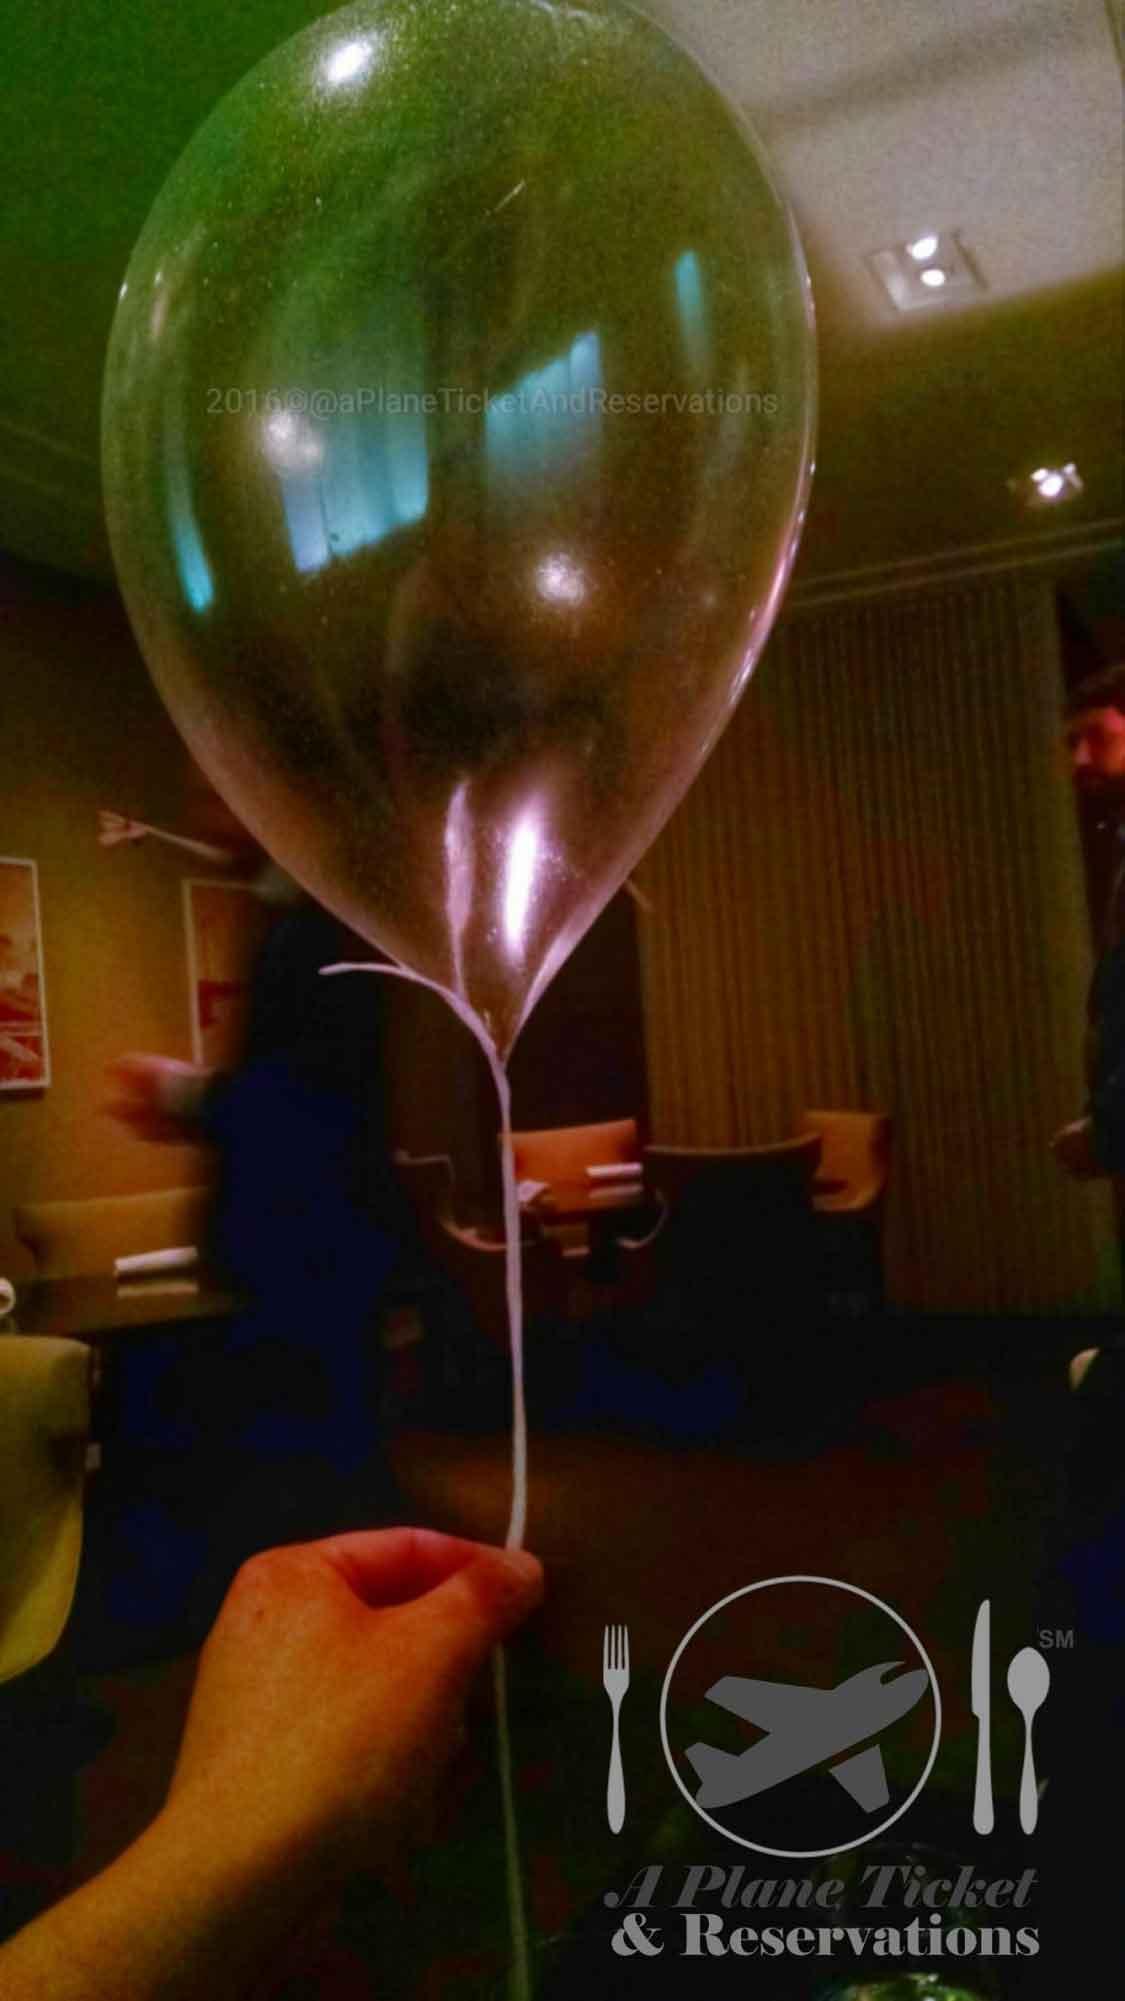 Table Haute Cuisine Alinea alinea & the avant-garde   a plane ticket & reservations